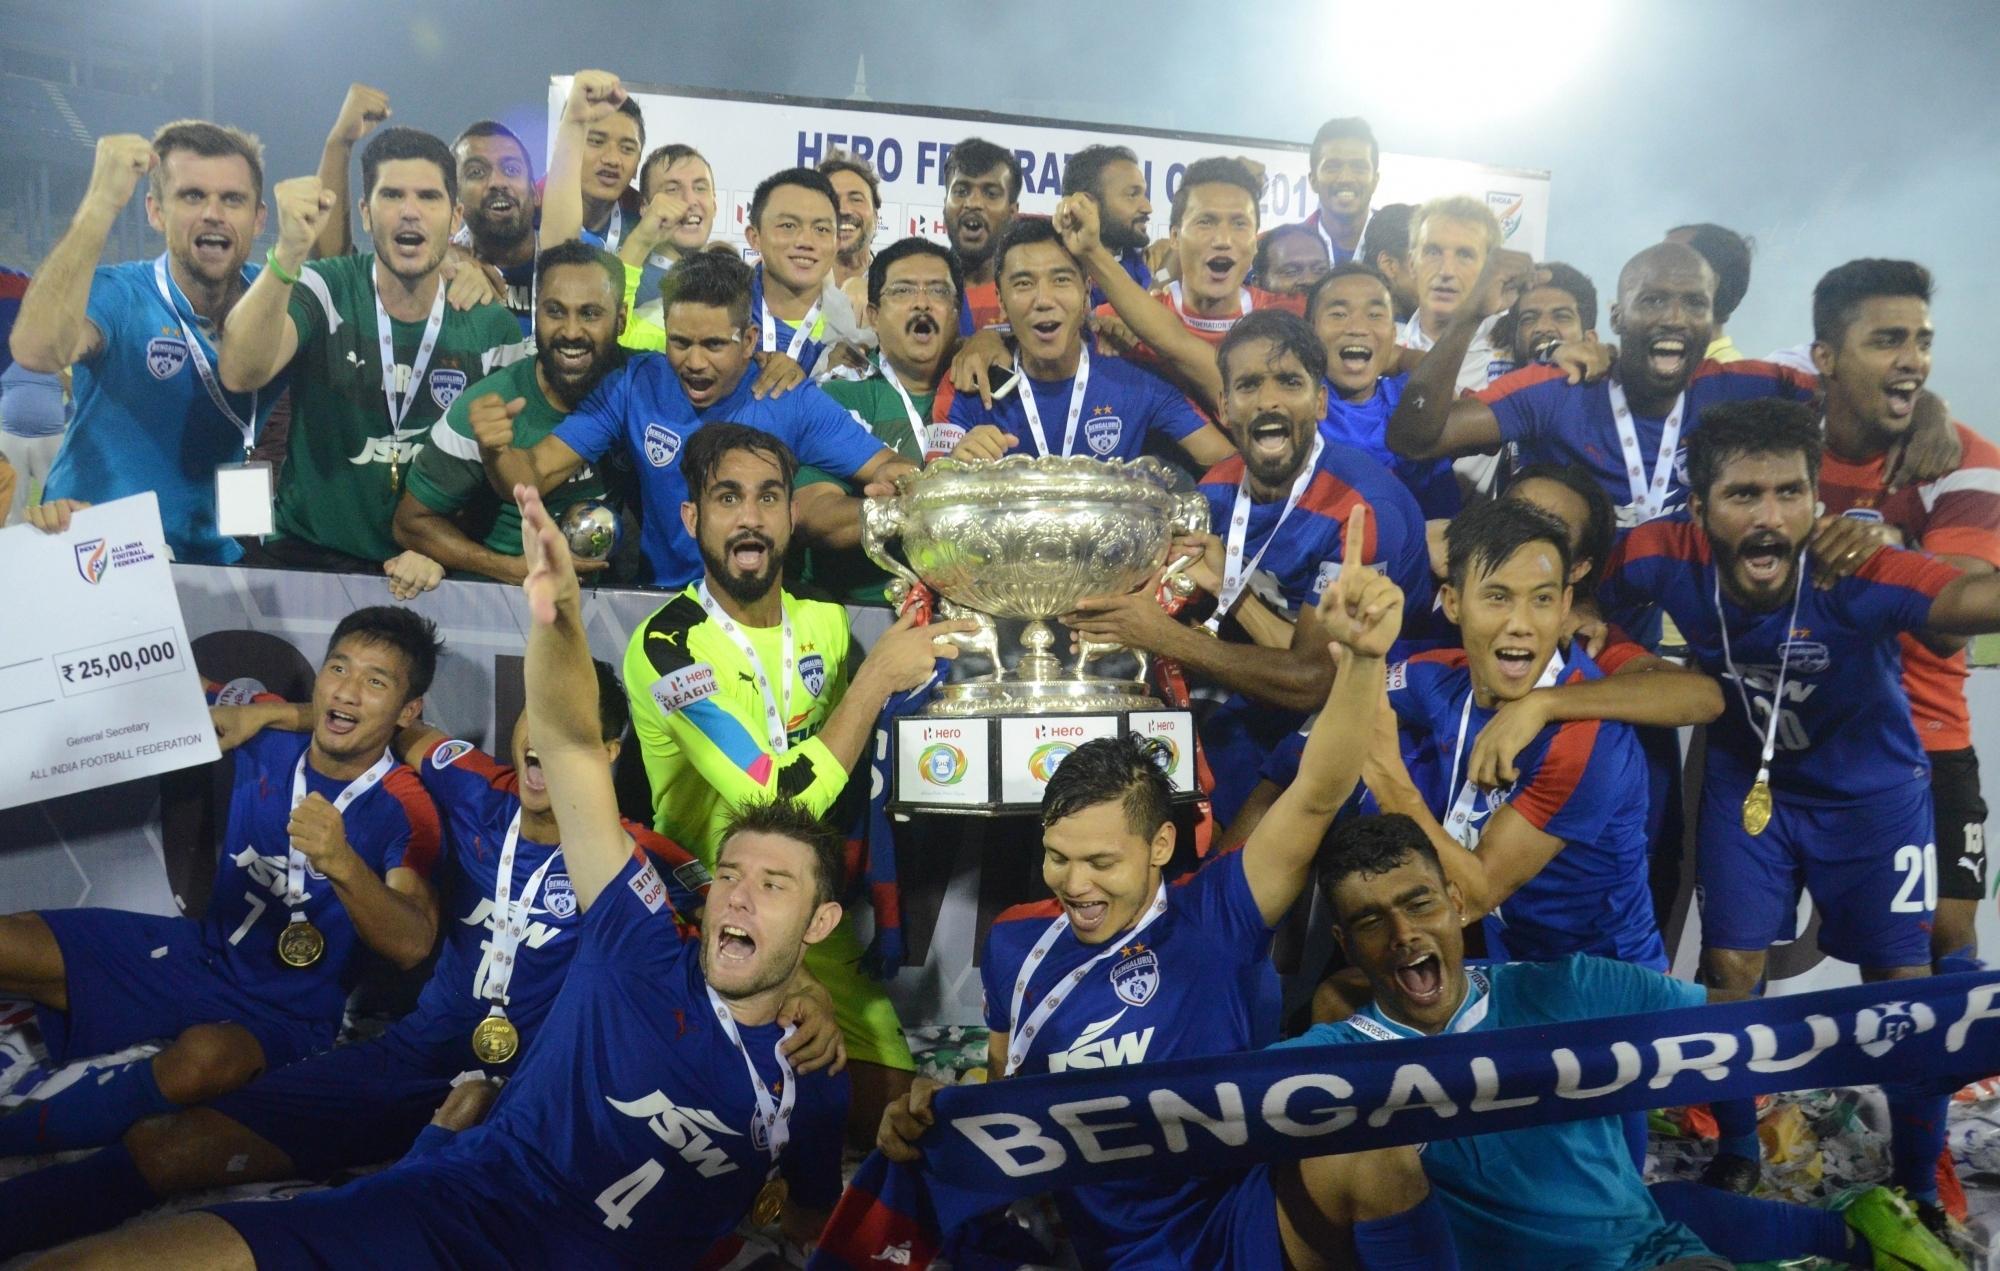 Bengaluru FC beat Mohun Bagan 2-0 to lift Federation Cup